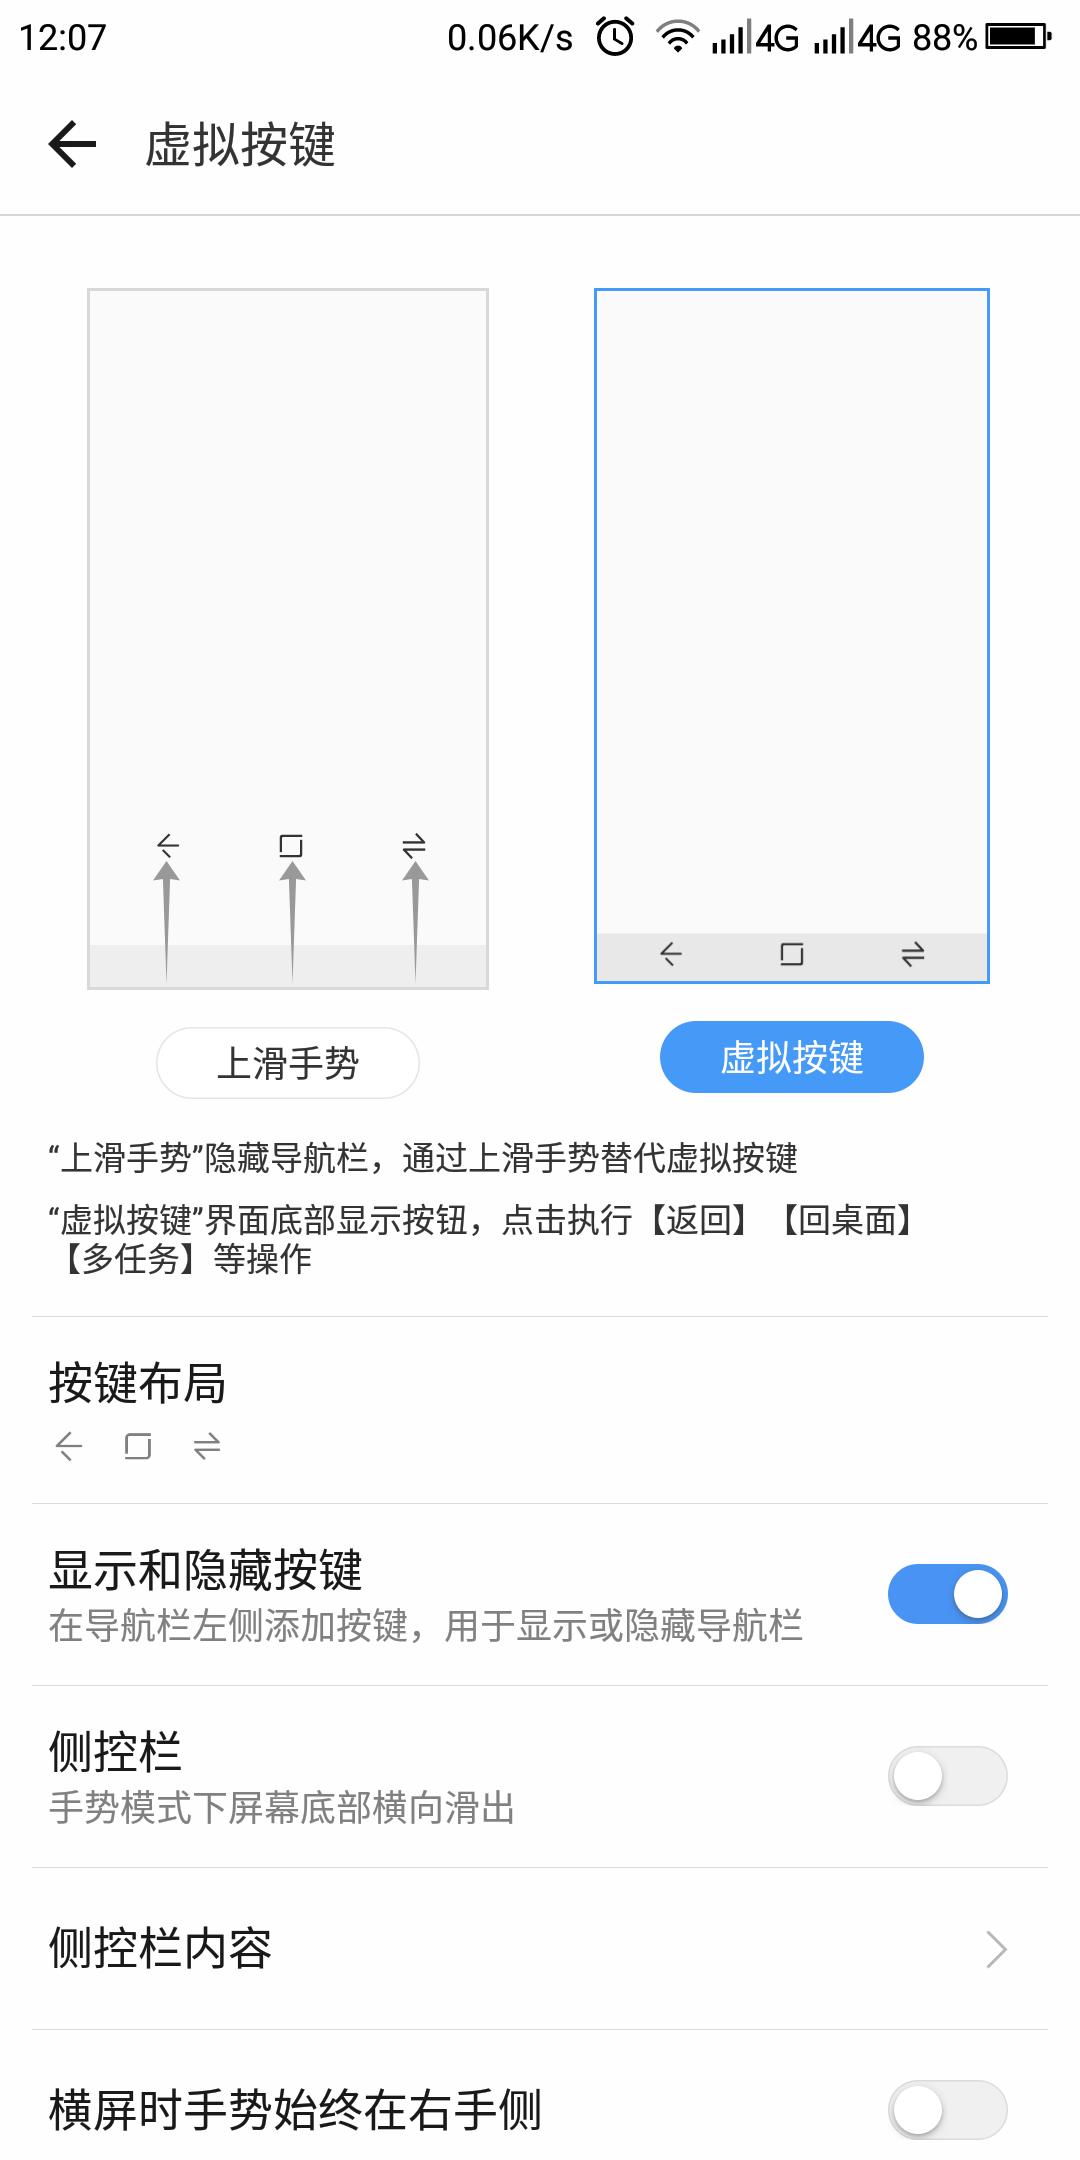 Screenshot_2018-10-08-12-07-49.png